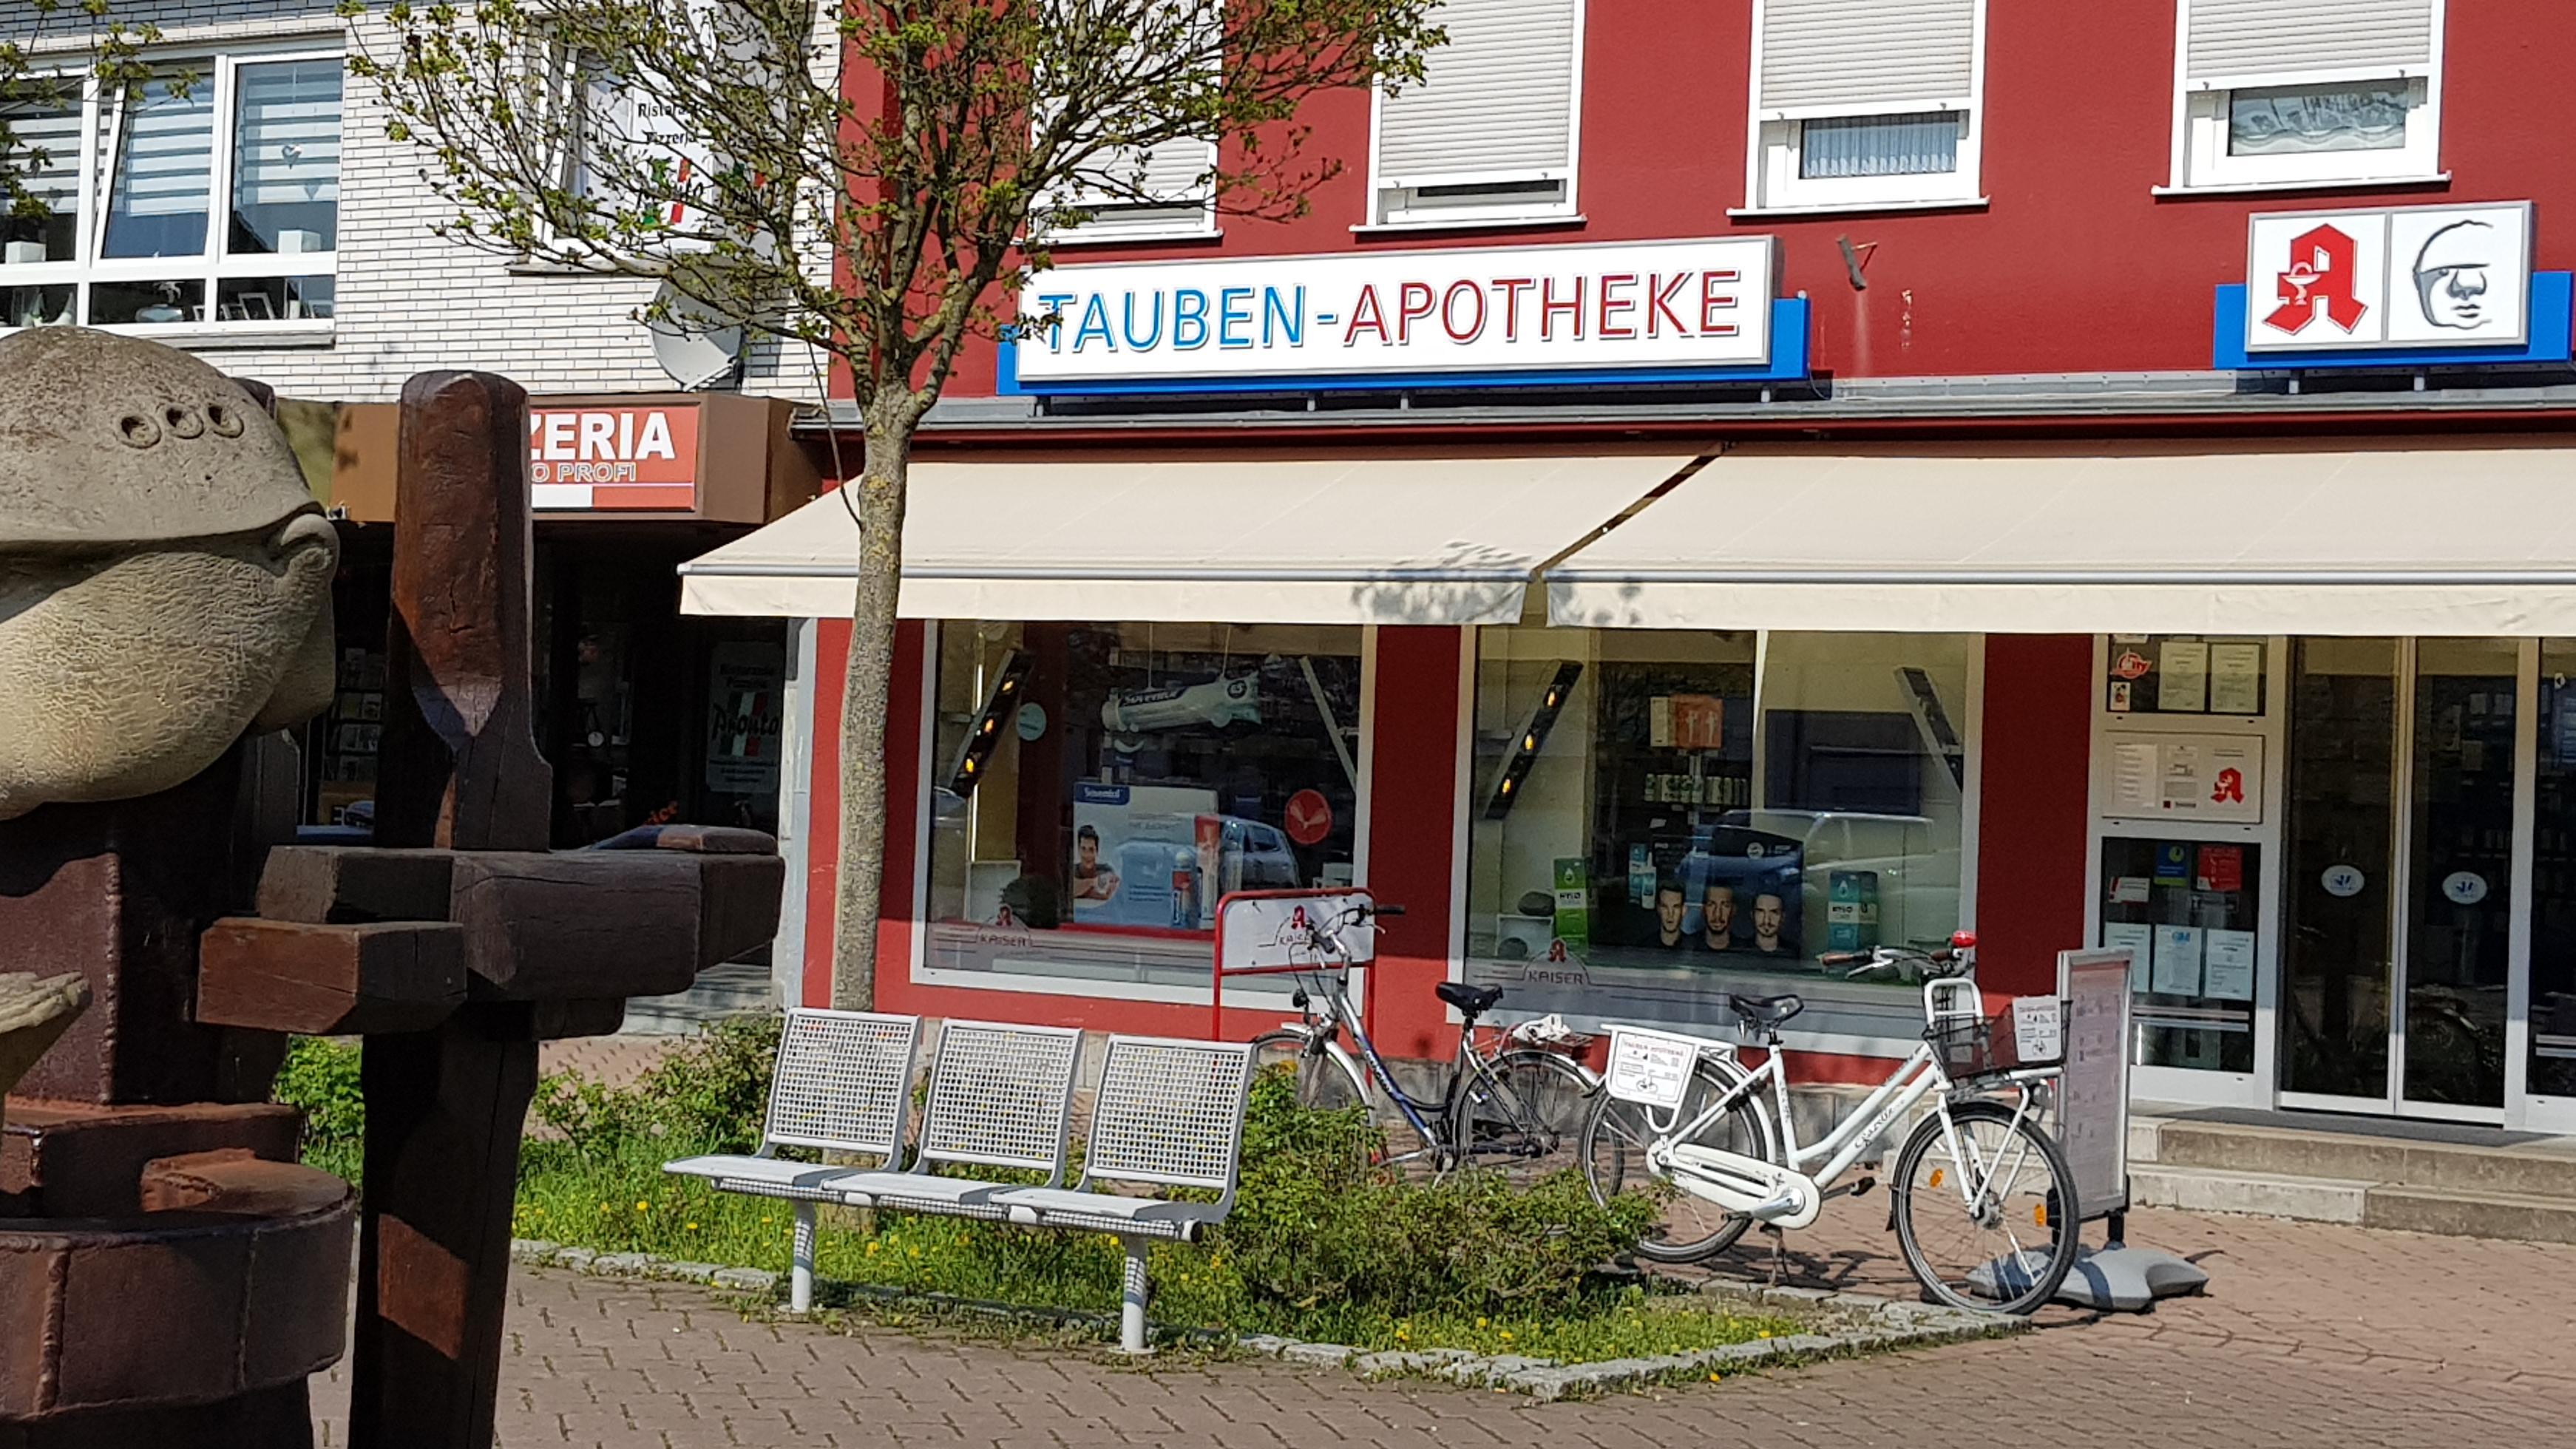 Tauben - Apotheke, Markt Königsborn in Unna